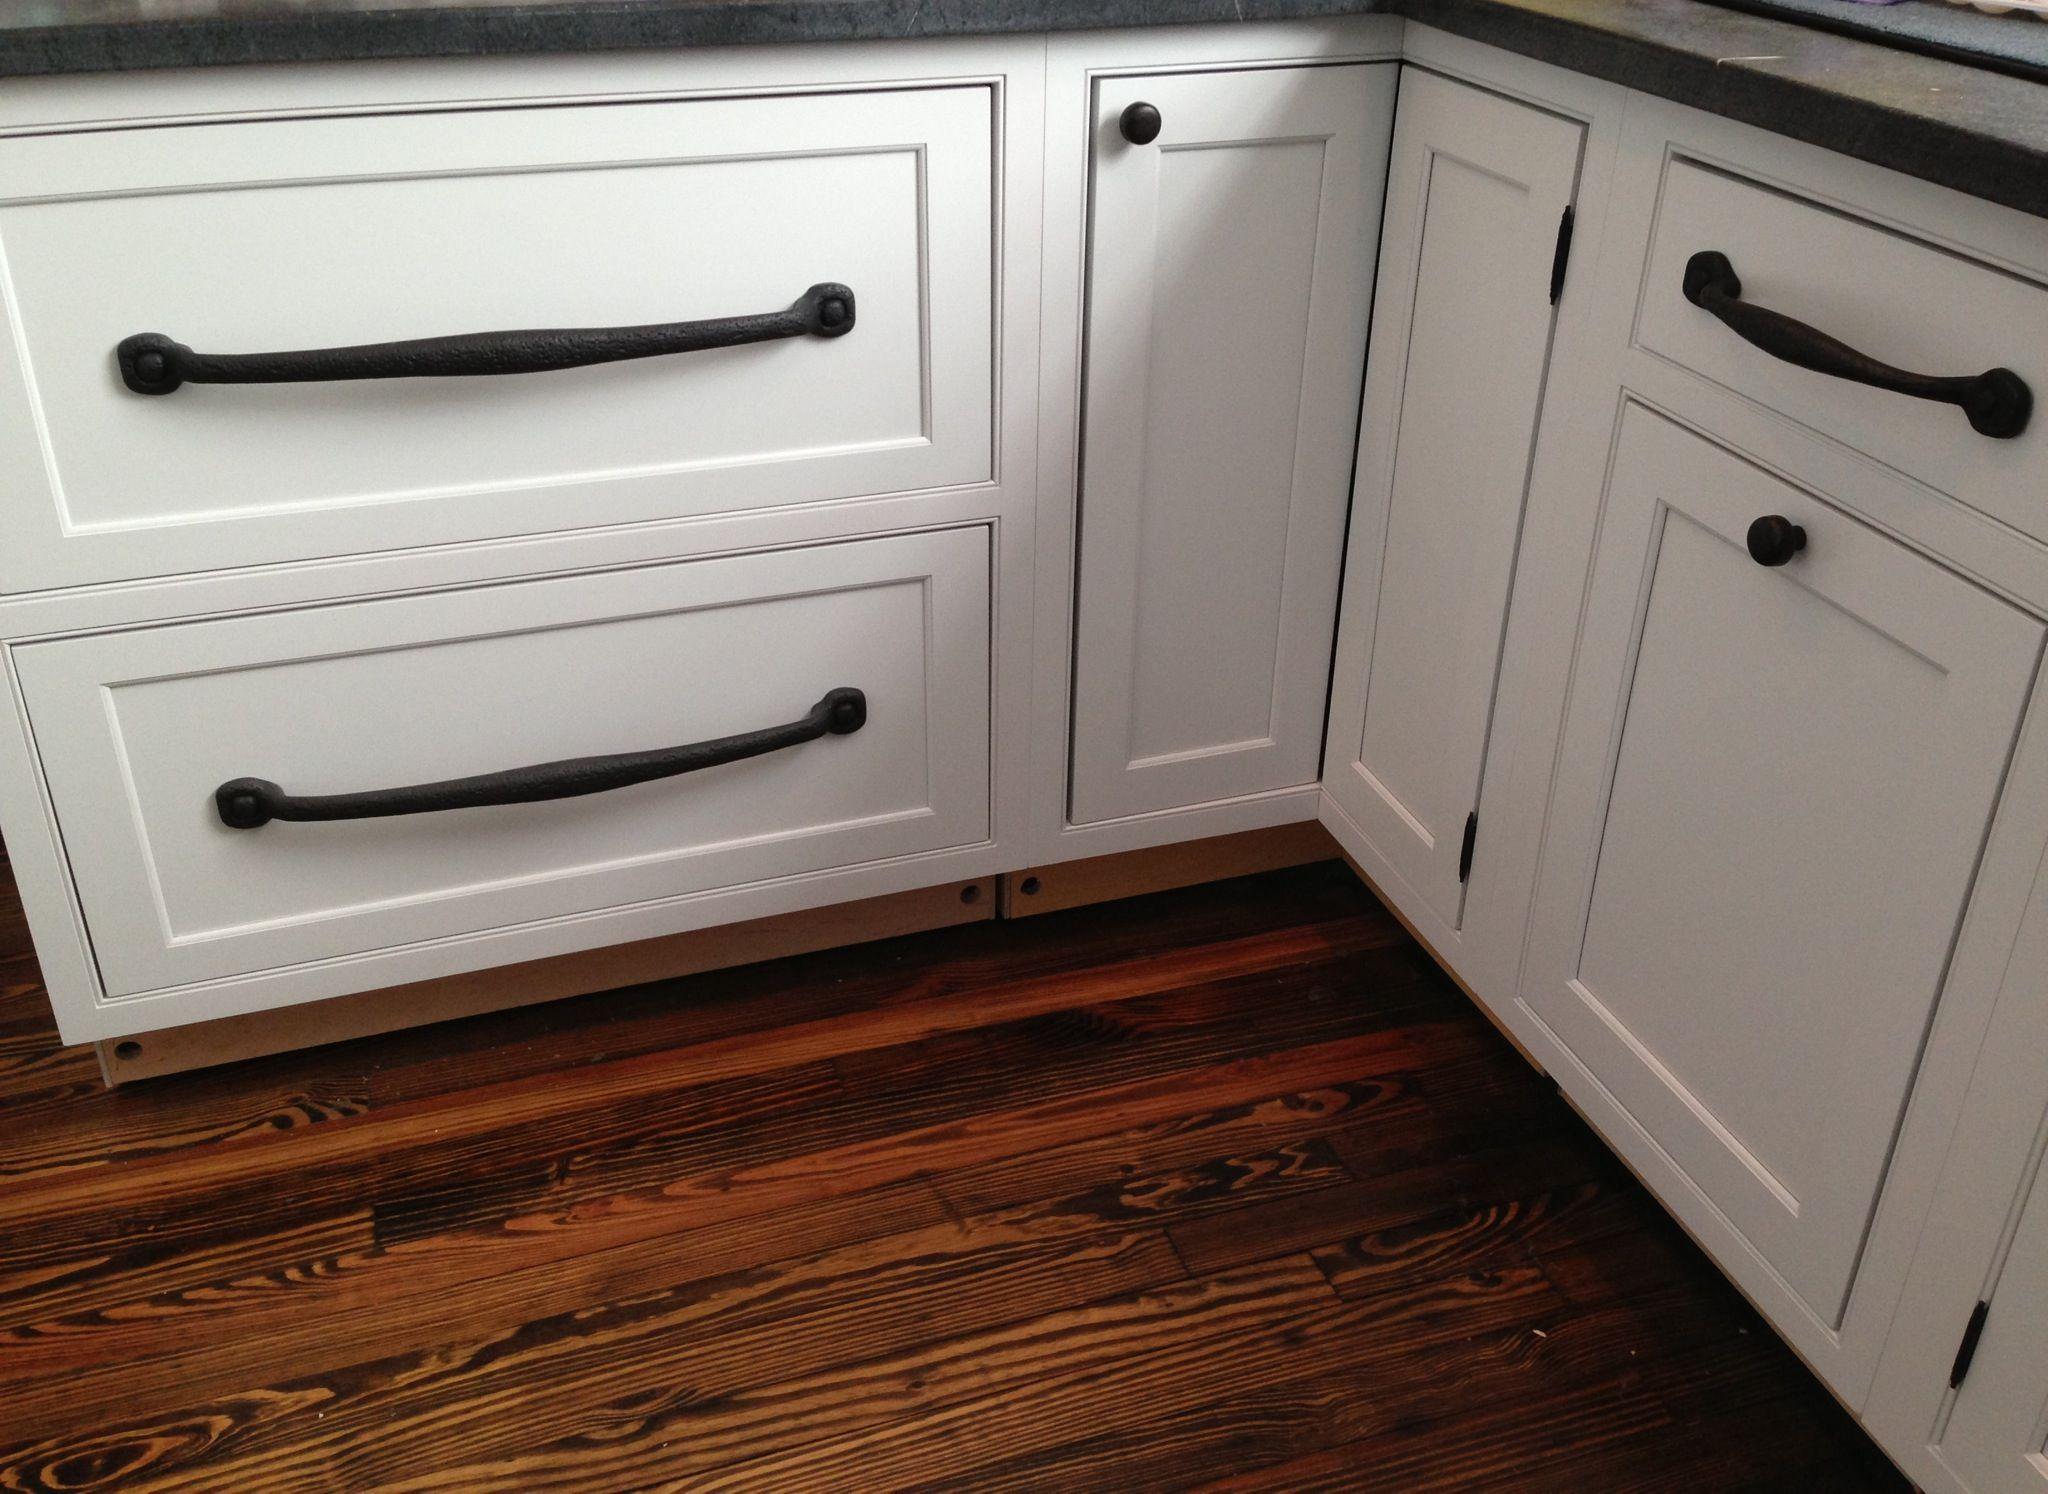 large black iron bar pulls restoration hardware iron cabinet pulls on decora white inset kitchen - Restoration Hardware Kitchen Cabinet Pulls